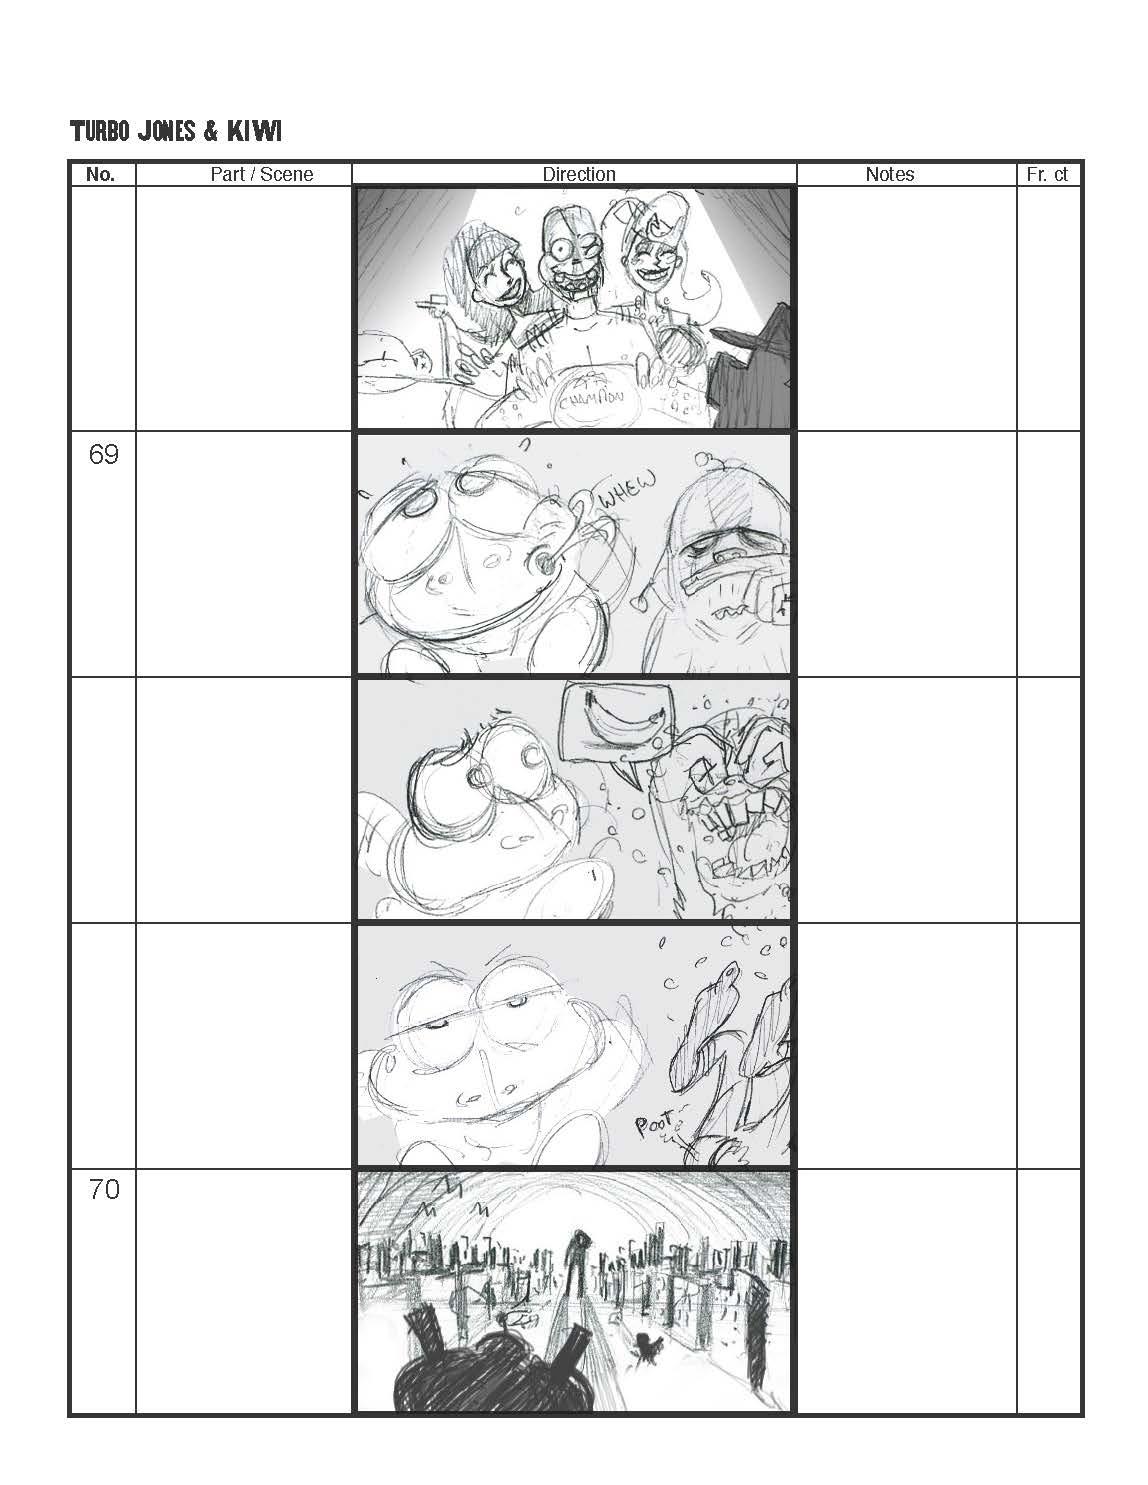 TJK_Storyboards_v01_HIGH_Page_34.jpg